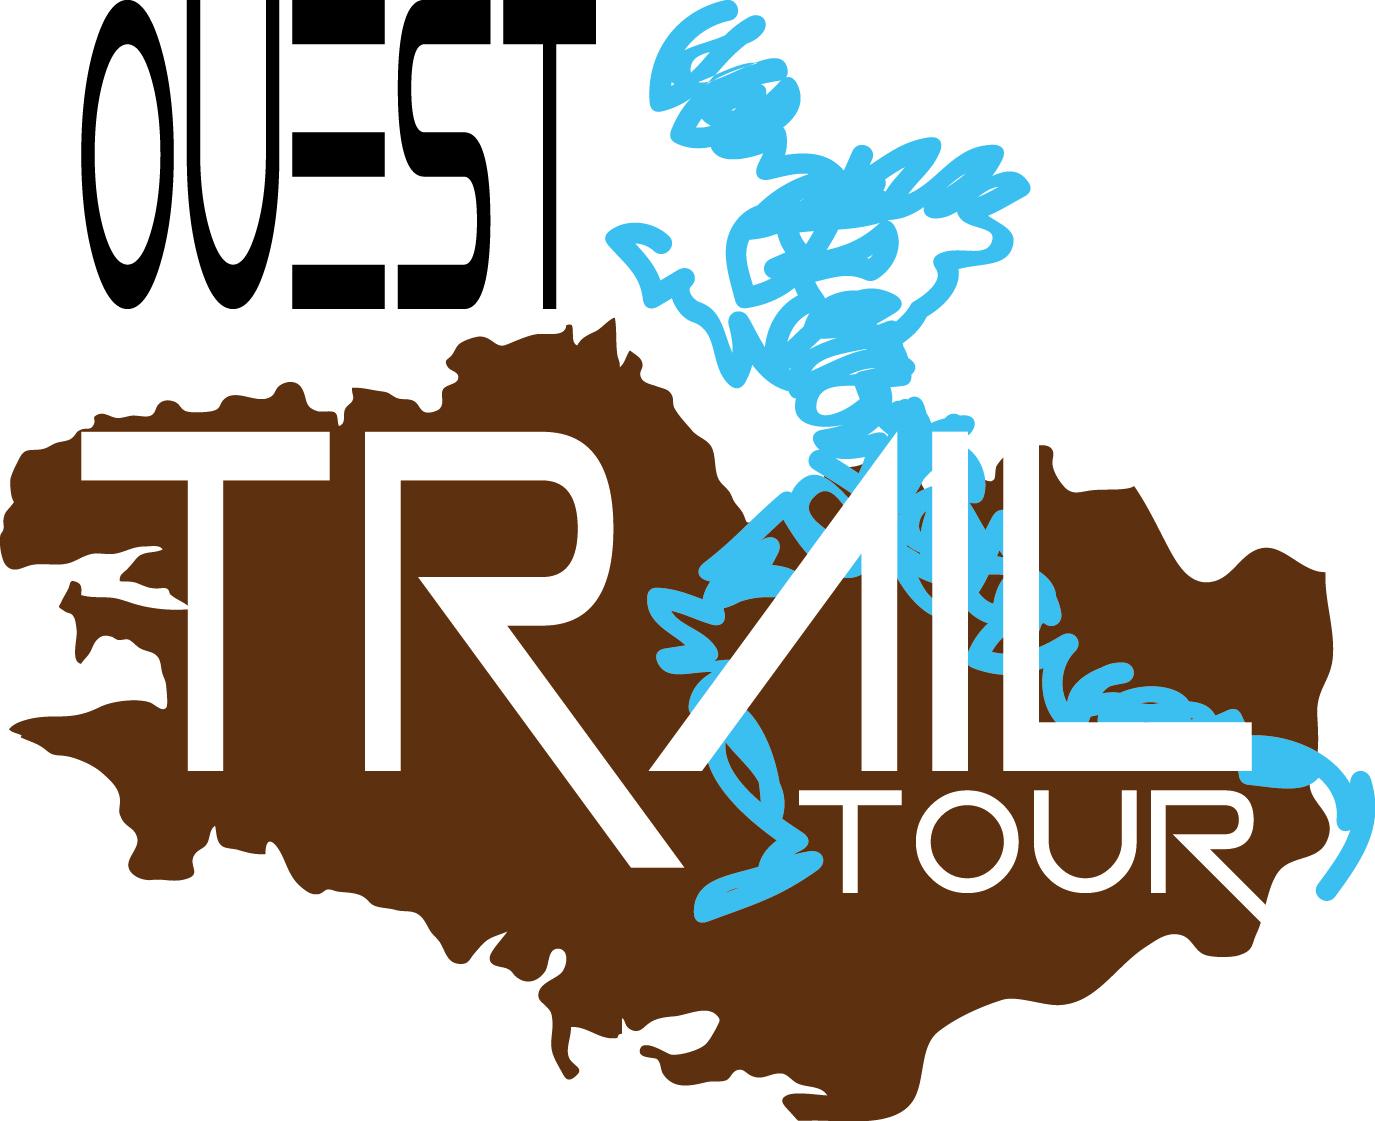 Logo Ouest Trail Tour